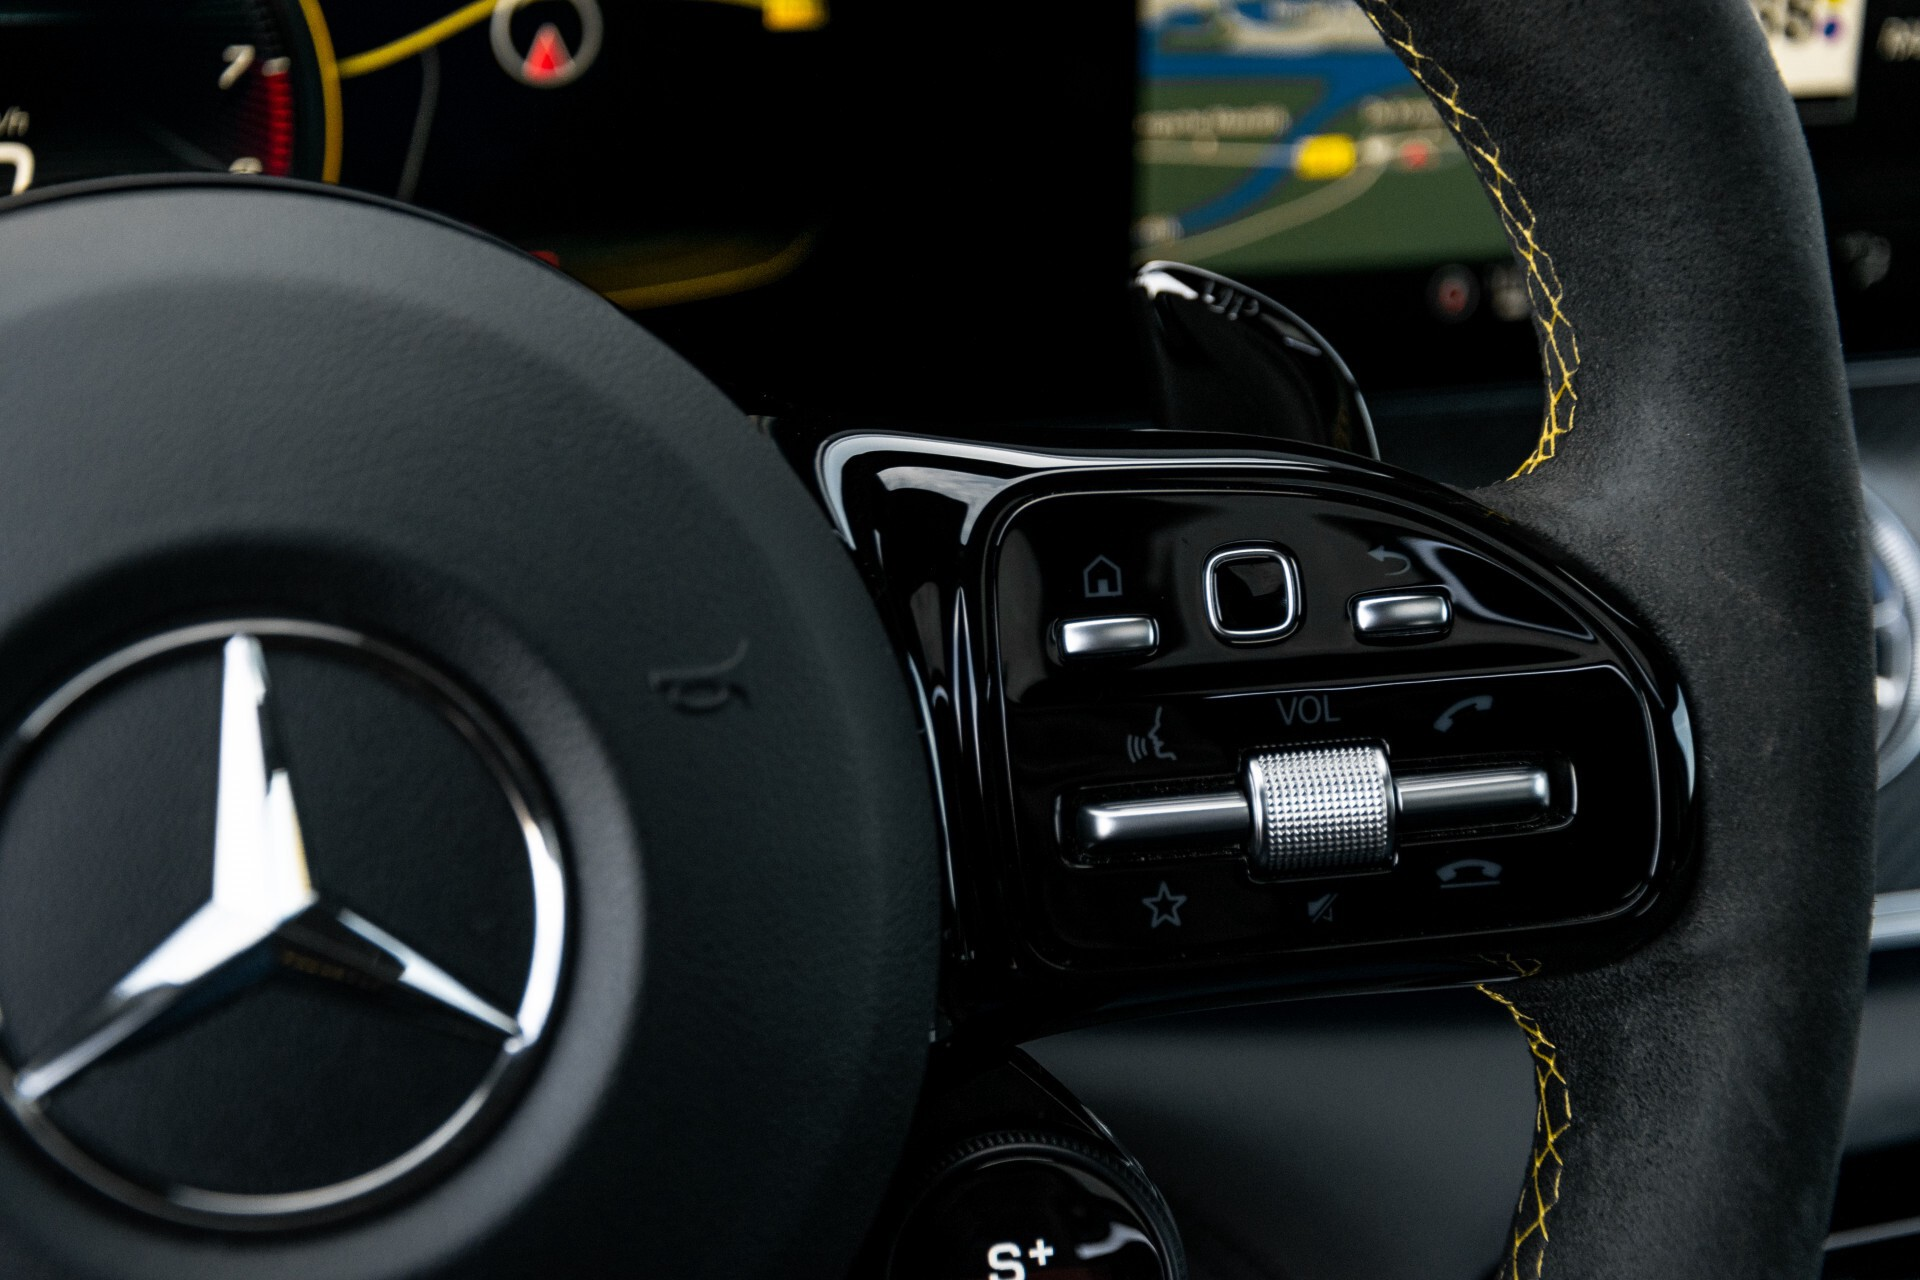 Mercedes-Benz AMG GT 4-Door Coupe 63 S 4MATIC+ Edition 1 Keramisch/Carbon/First Class/Dynamic Plus/Burmester High End 3D Aut9 Foto 17